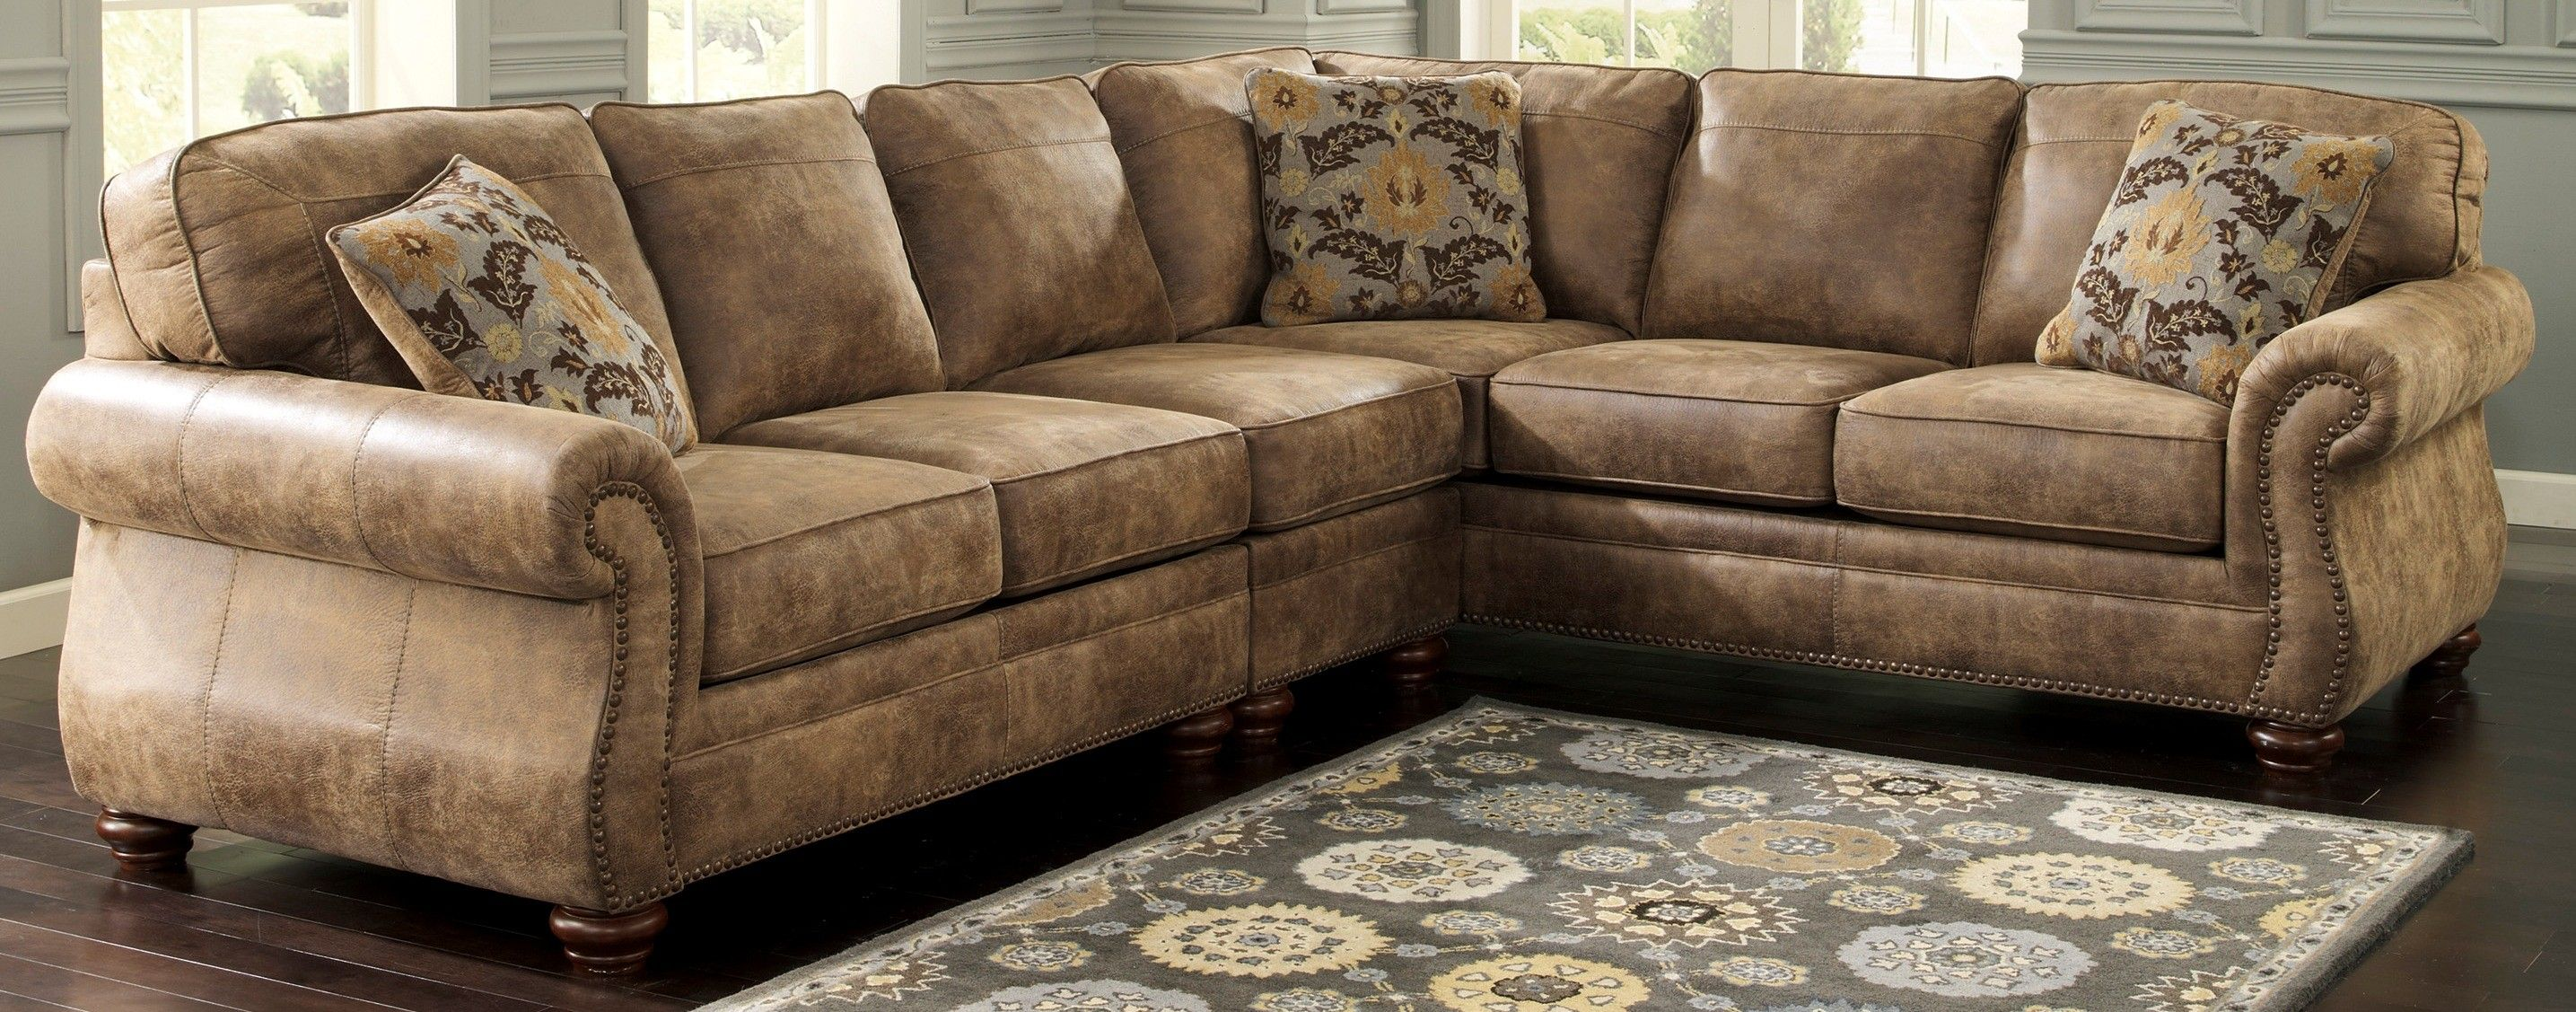 Ashley Furniture Larkinhurst Earth Sectional